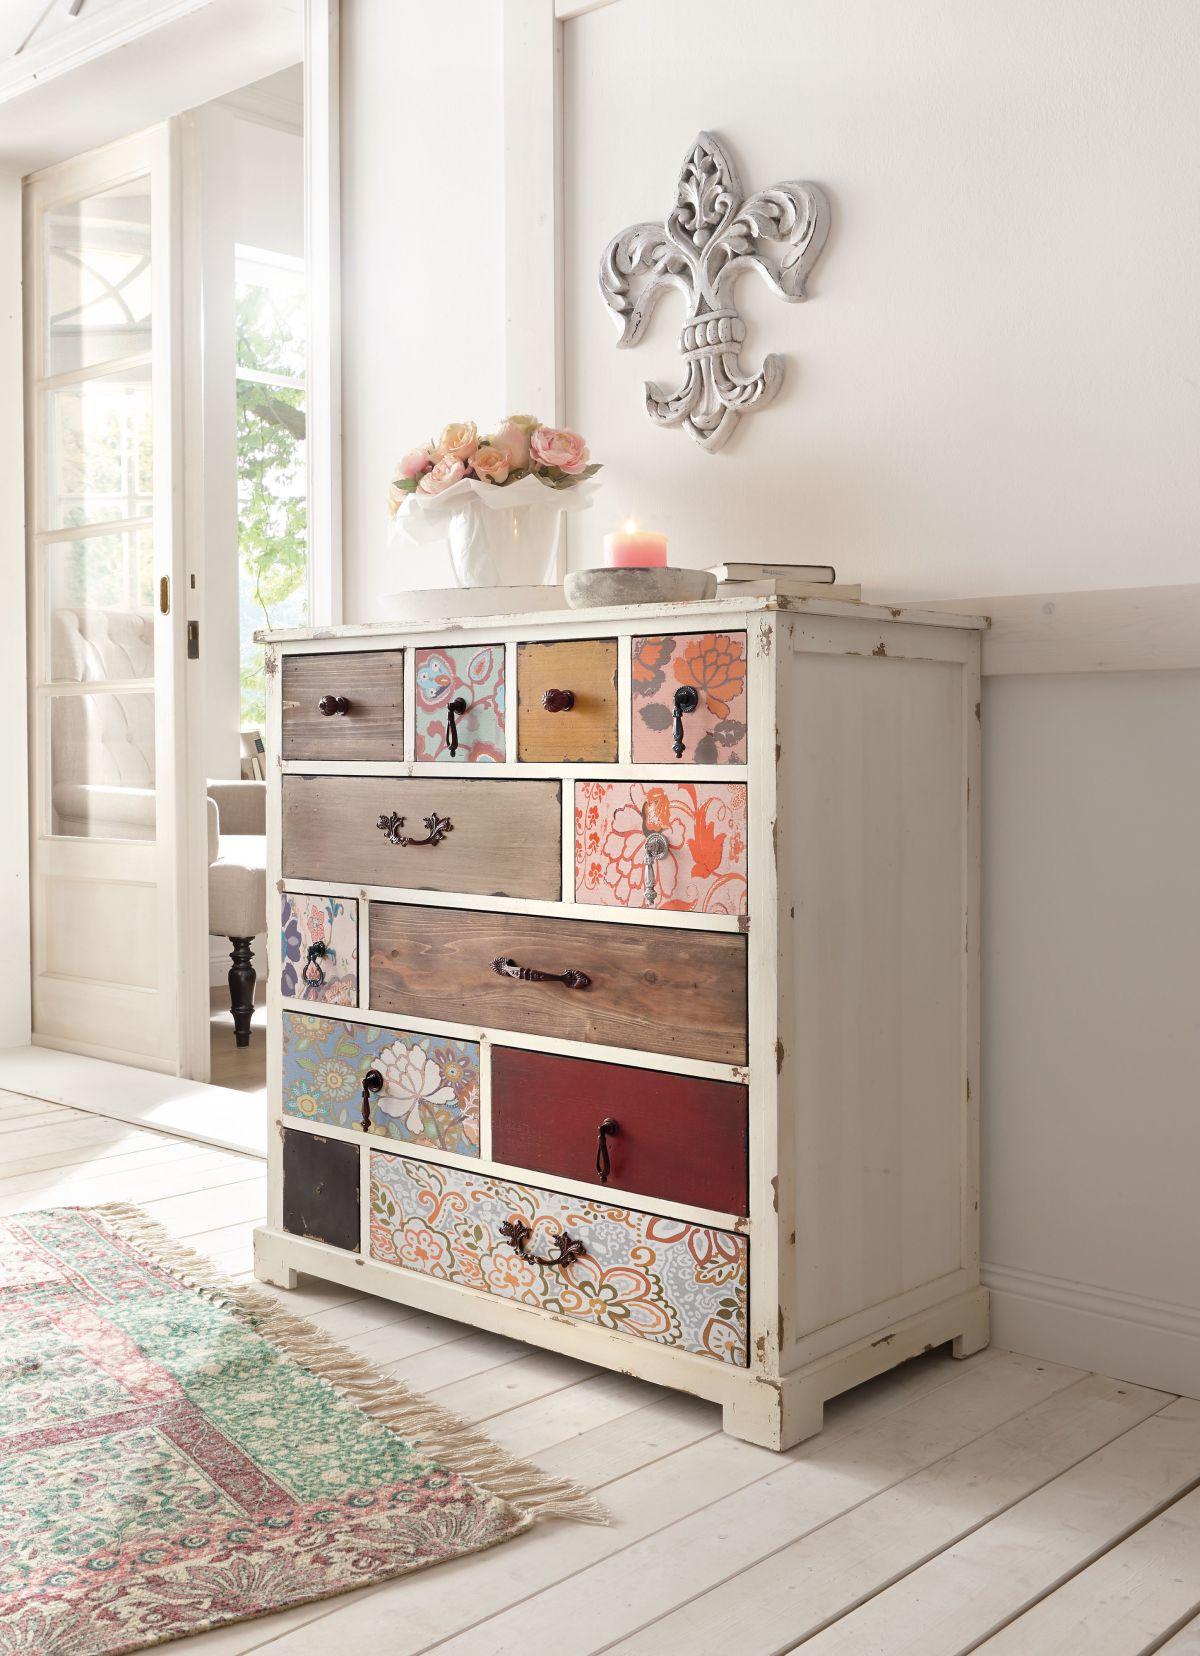 massivholz kommode schubladenschrank rio shabby style versandkostenfreie. Black Bedroom Furniture Sets. Home Design Ideas